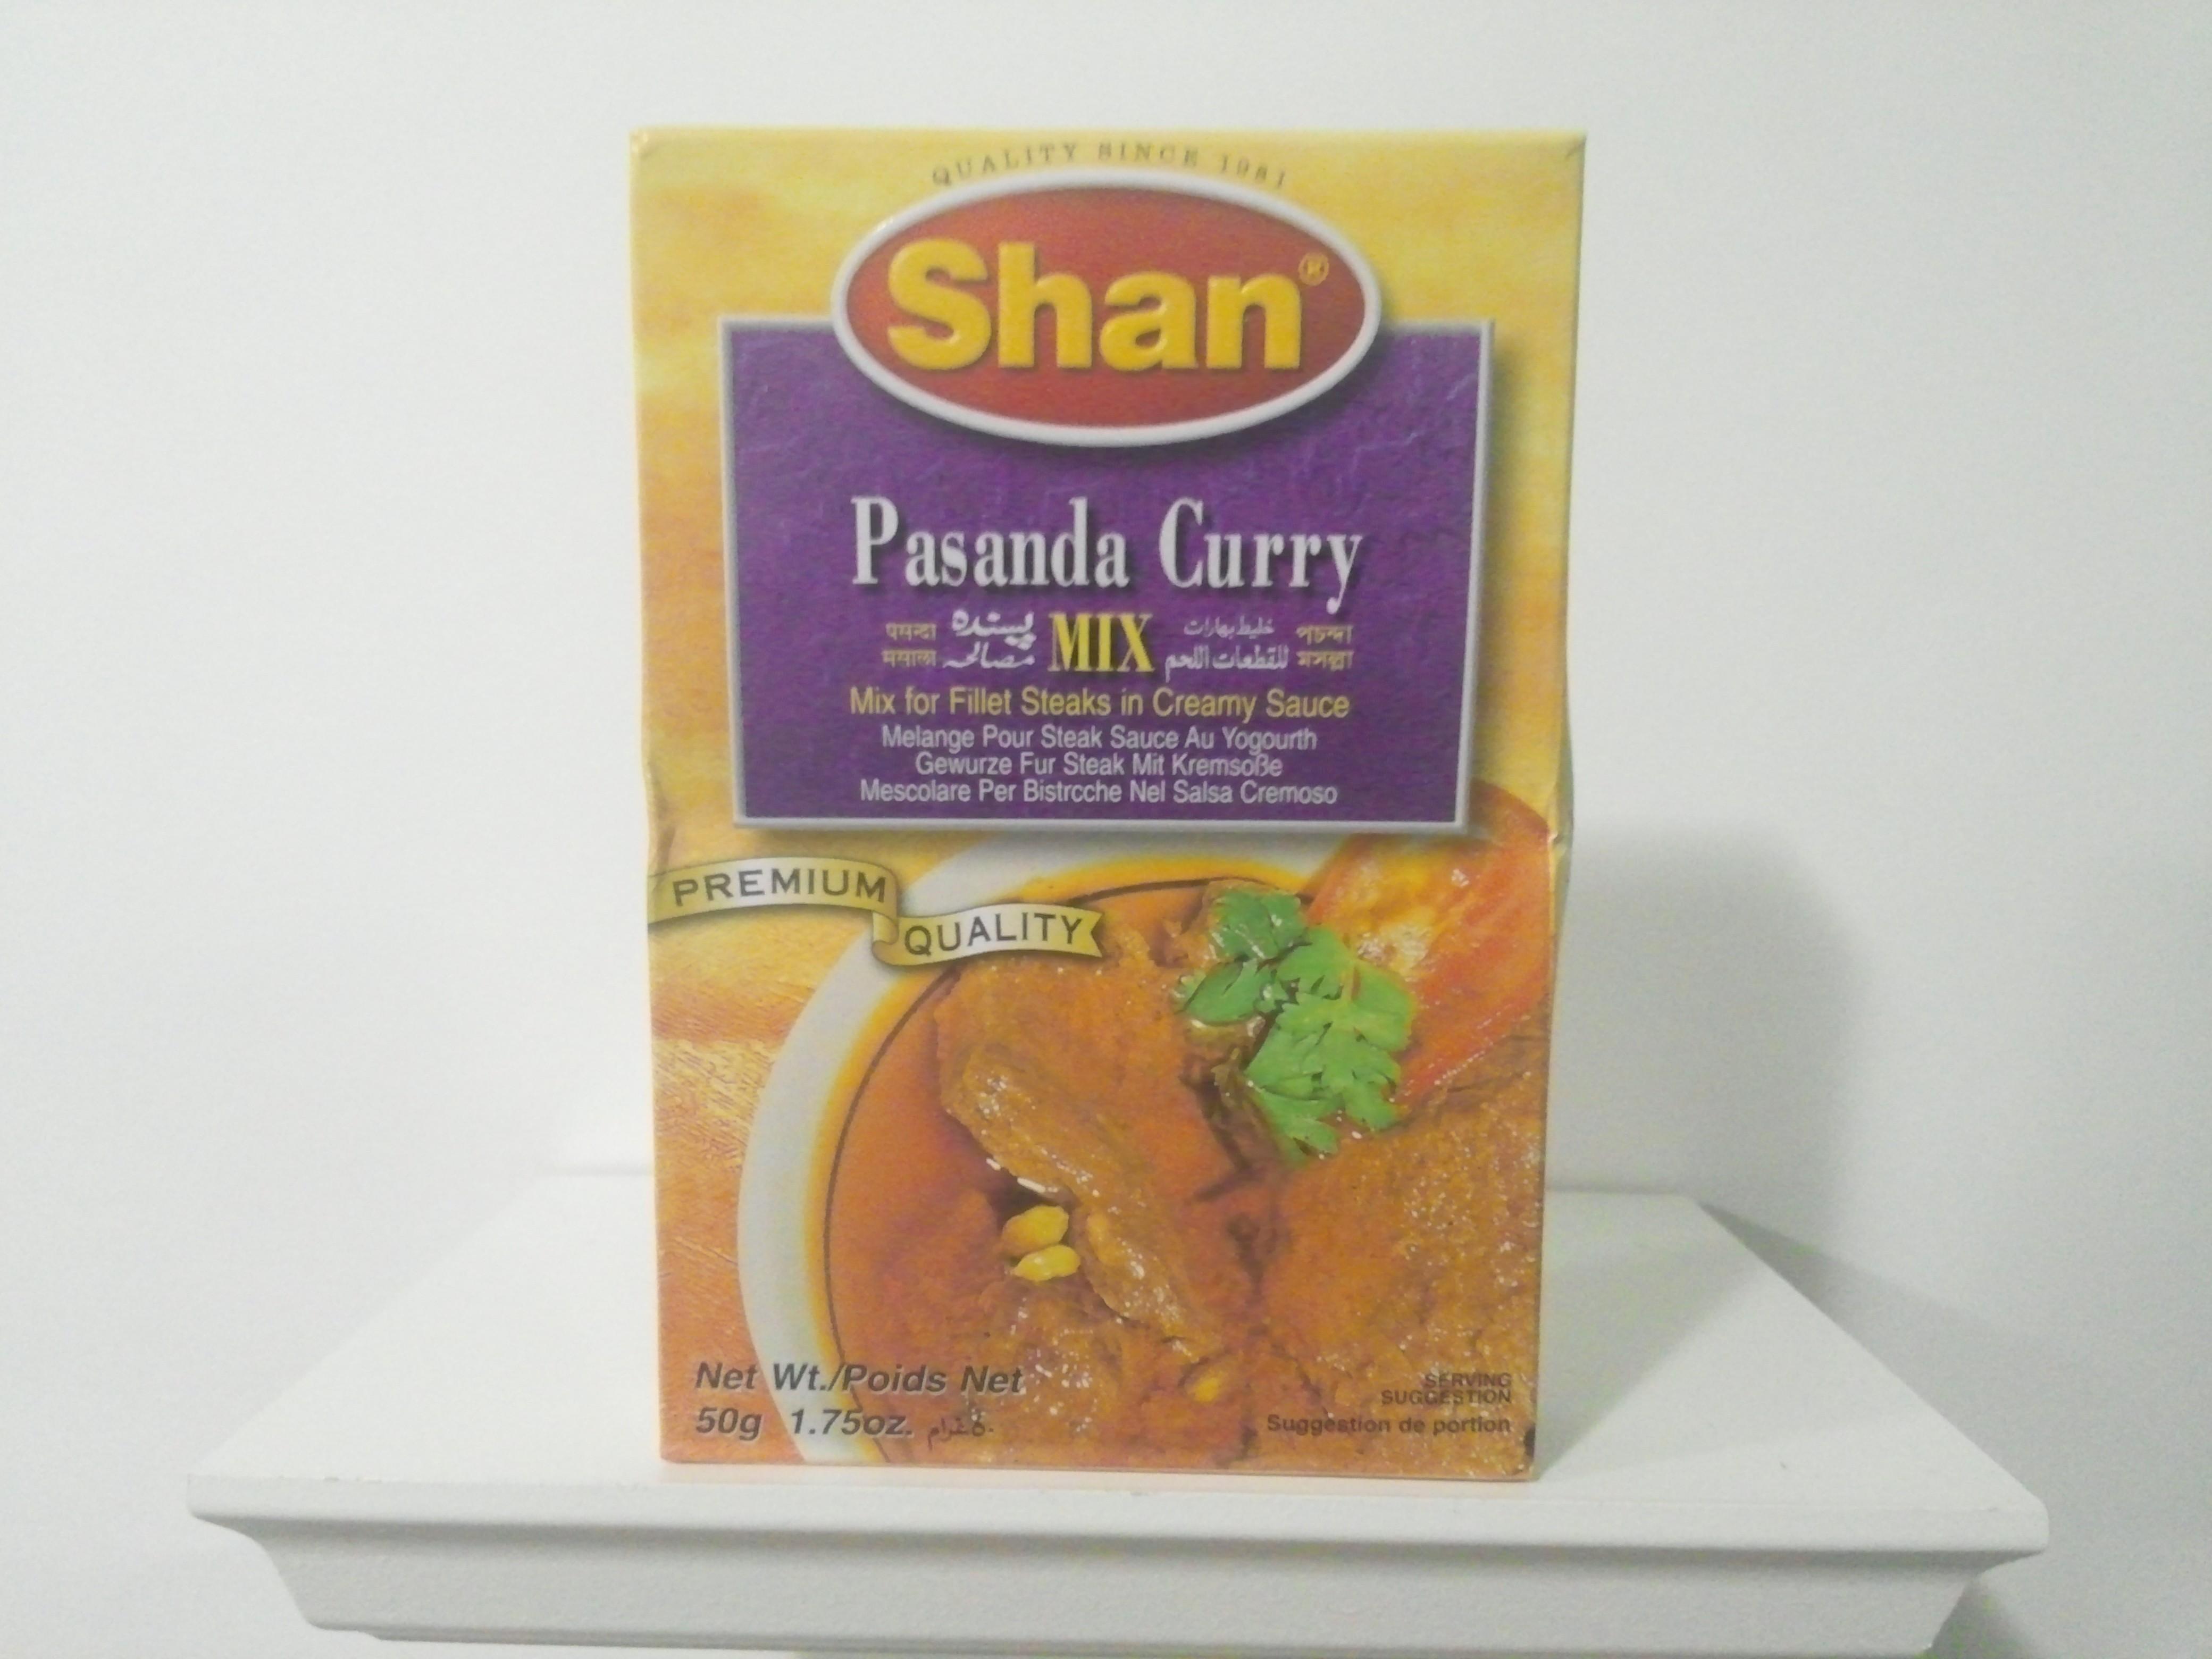 Shan Pasanda Curry Spice Mix 50 grm